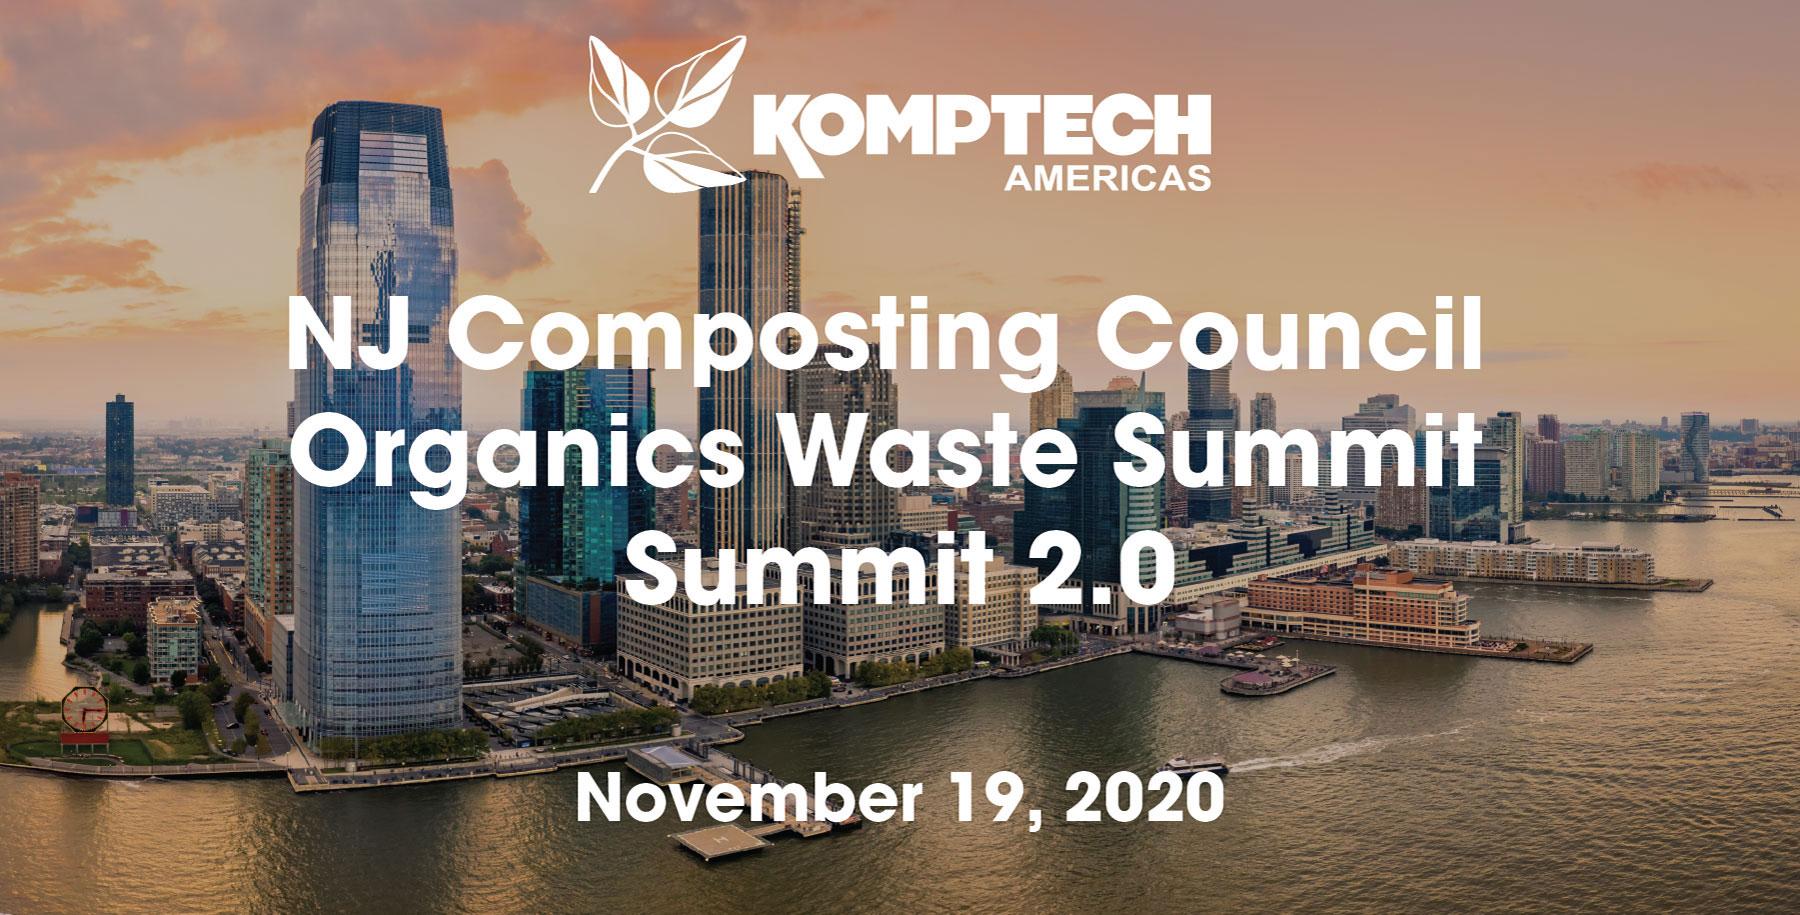 NJ Composting Council Organics Waste Summit 2.0 - November 19, 2020